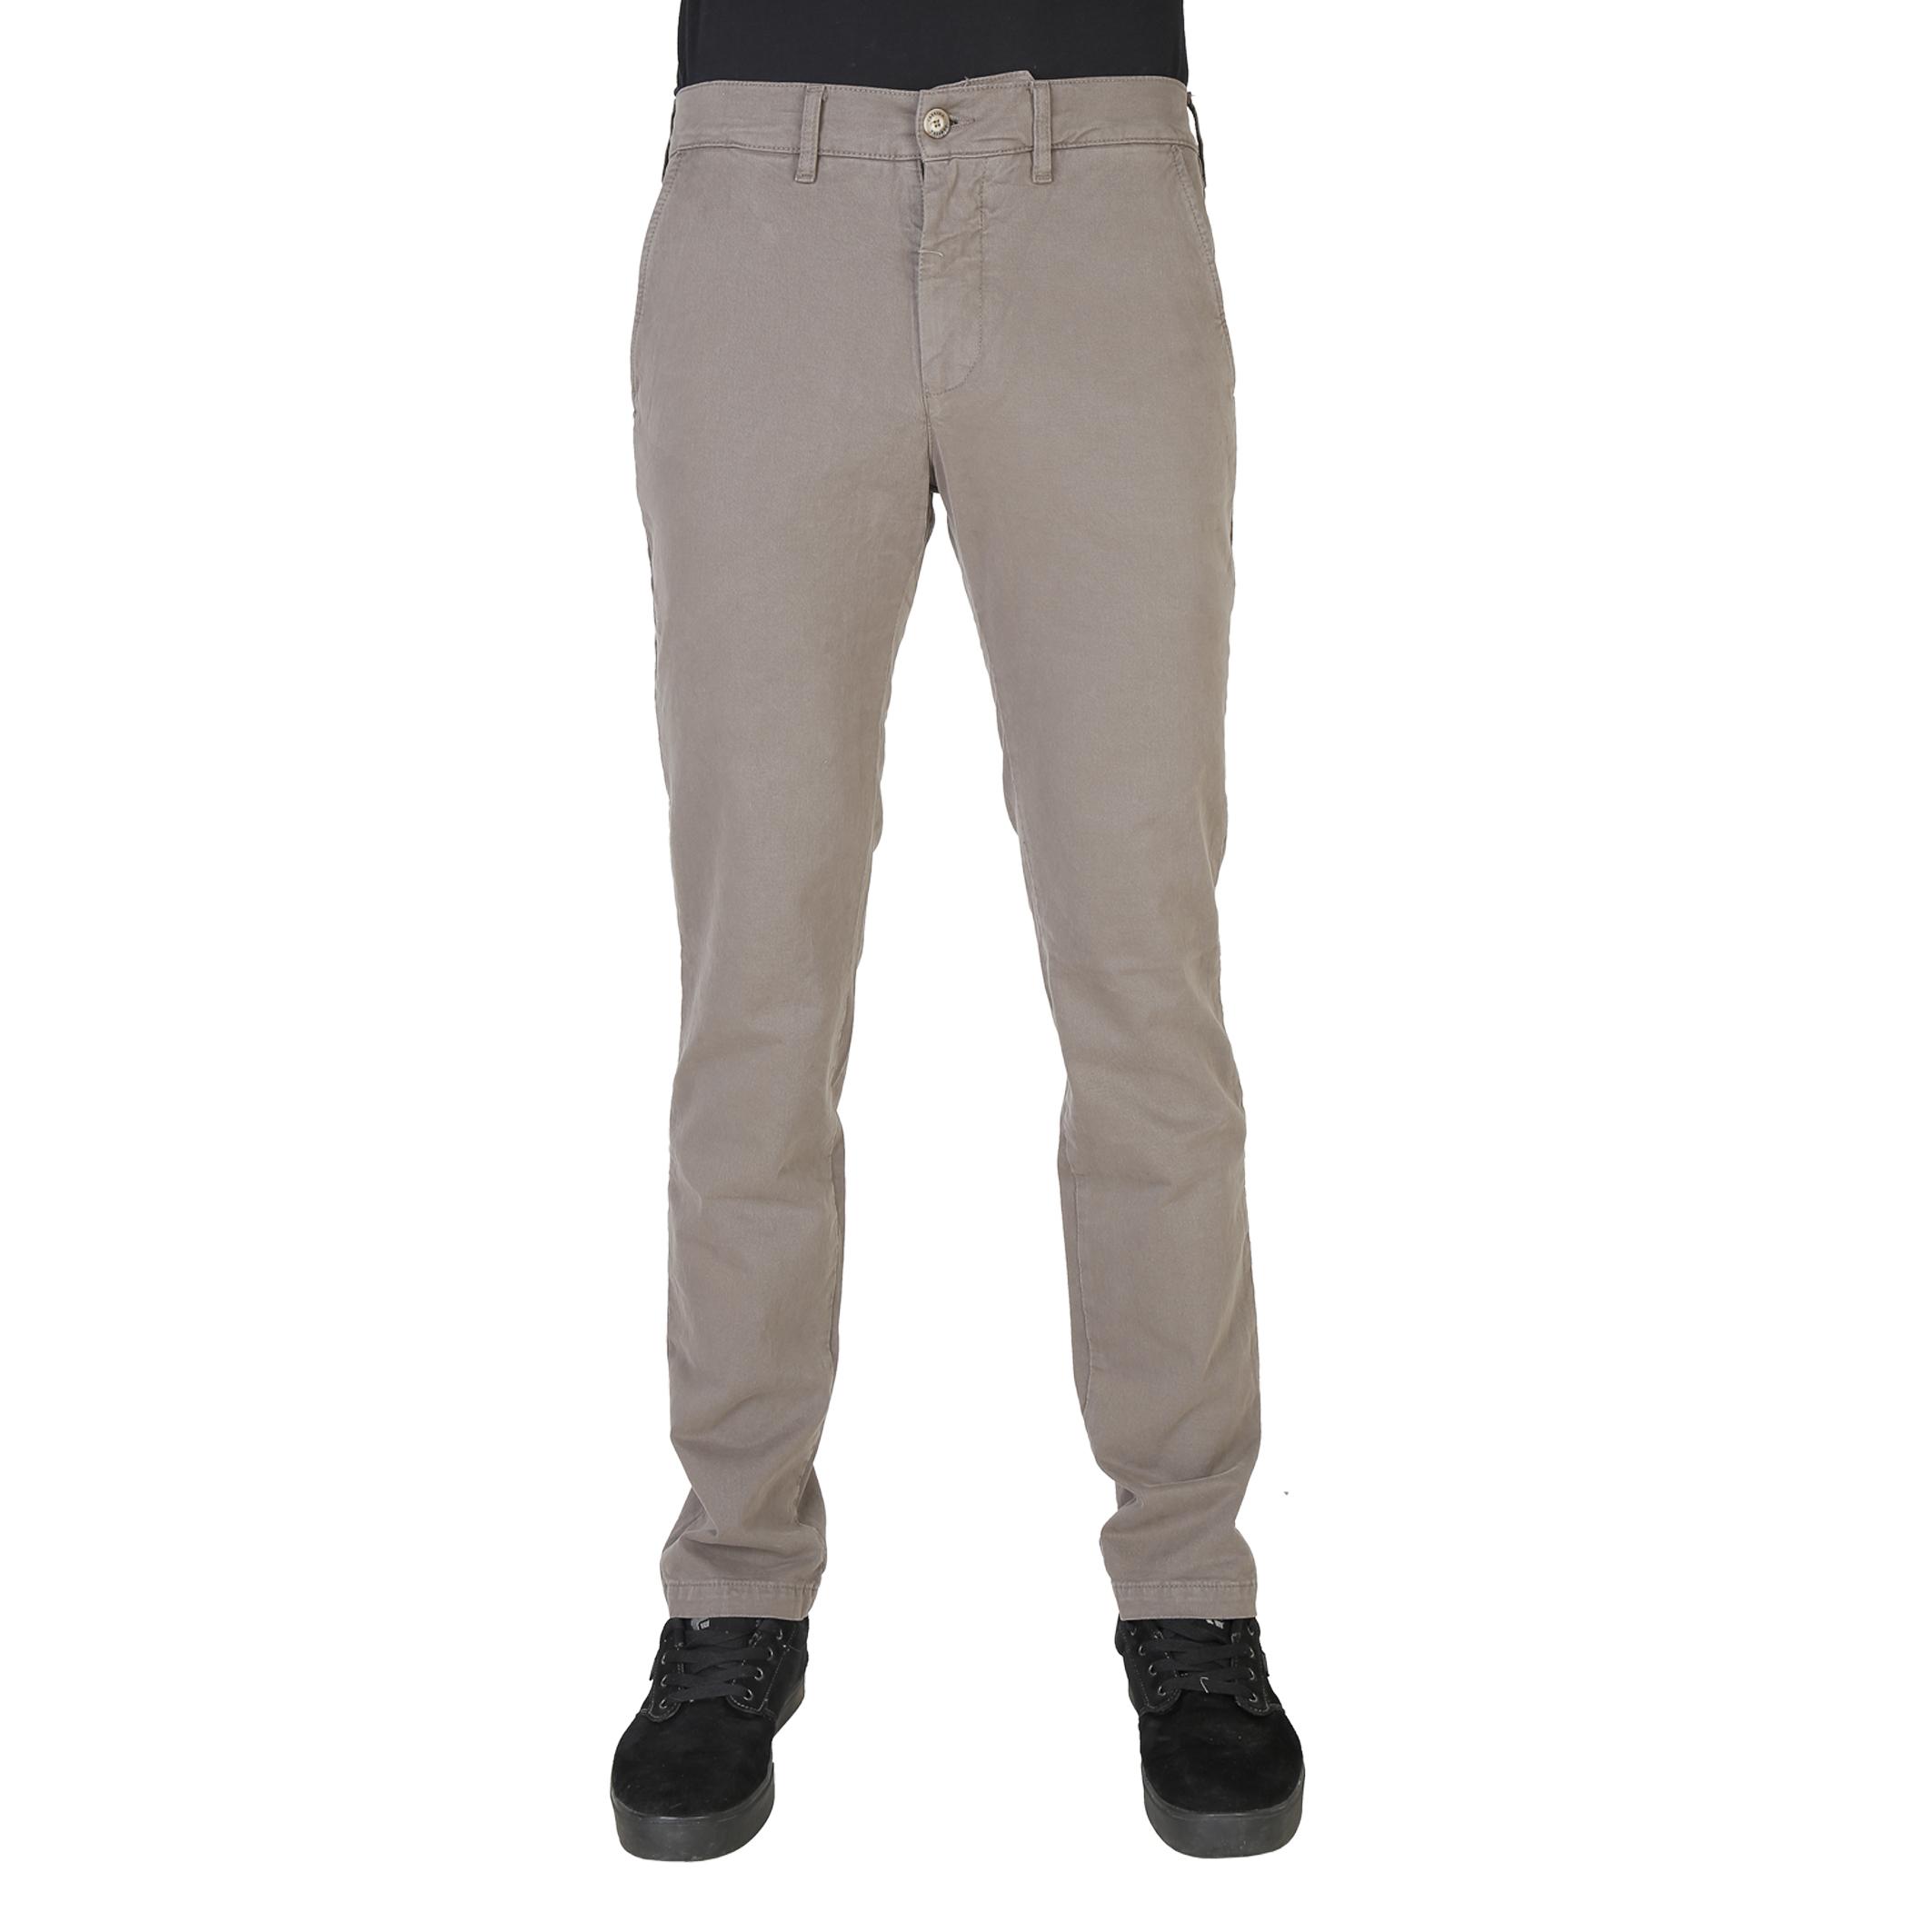 Pantalons  Carrera Jeans 000624_0945A brown